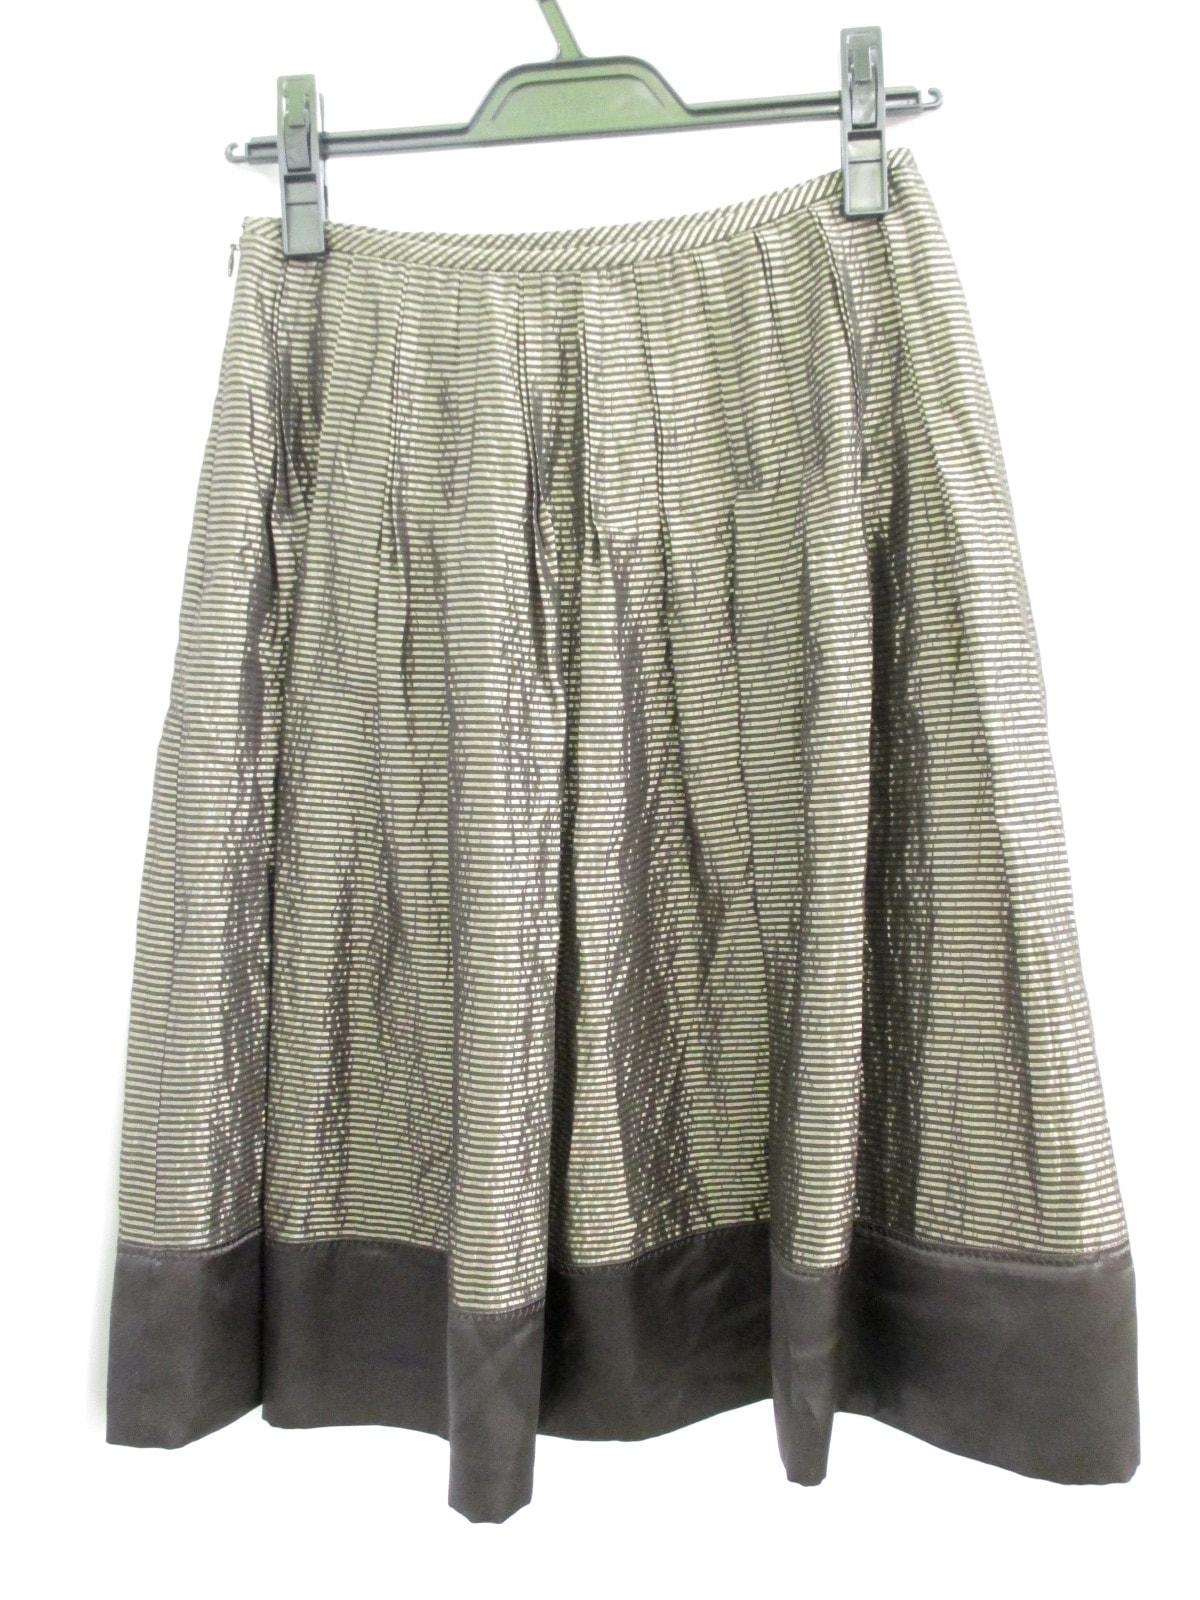 Magia(マージア)のスカート